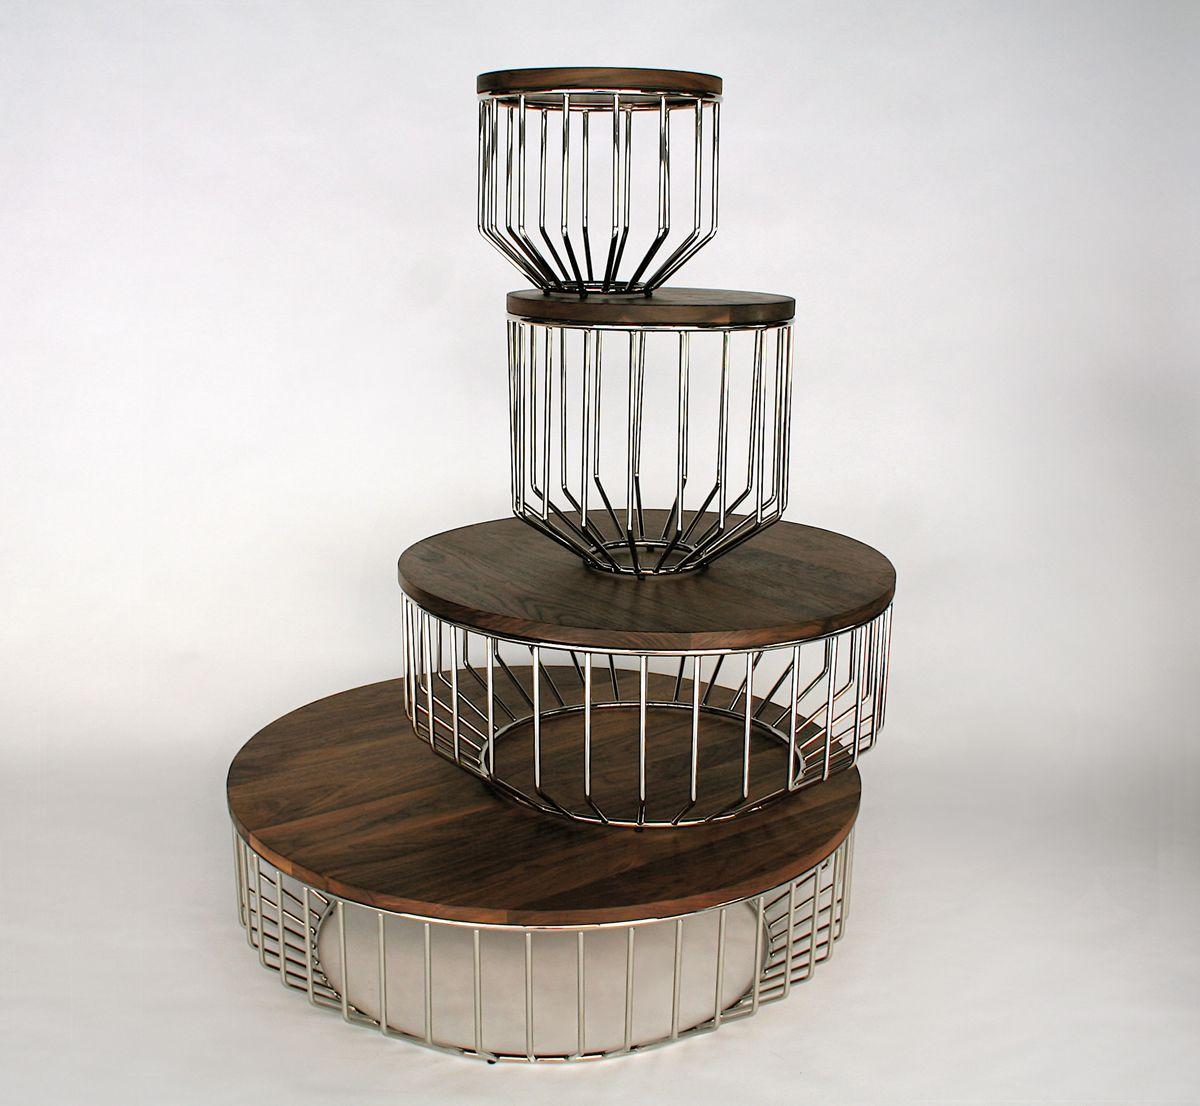 Phase Design | Reza Feiz Designer | Wired Coffee Table - Phase ...